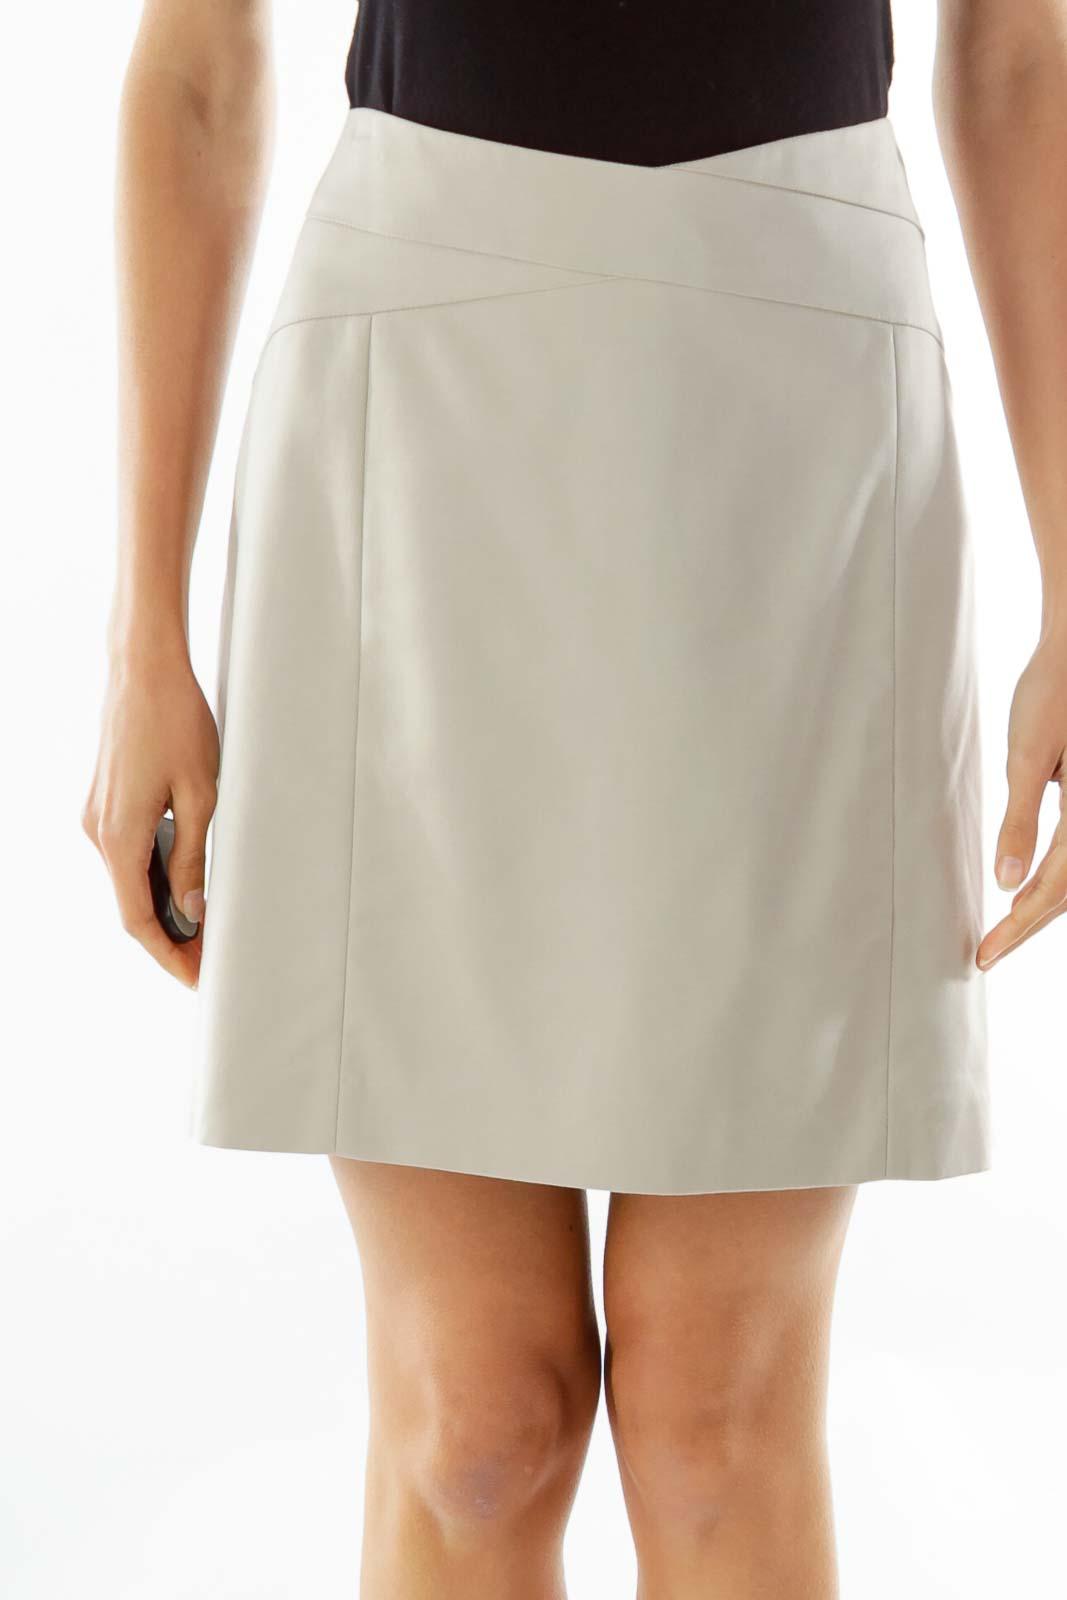 Beige Pencil Work Skirt Front